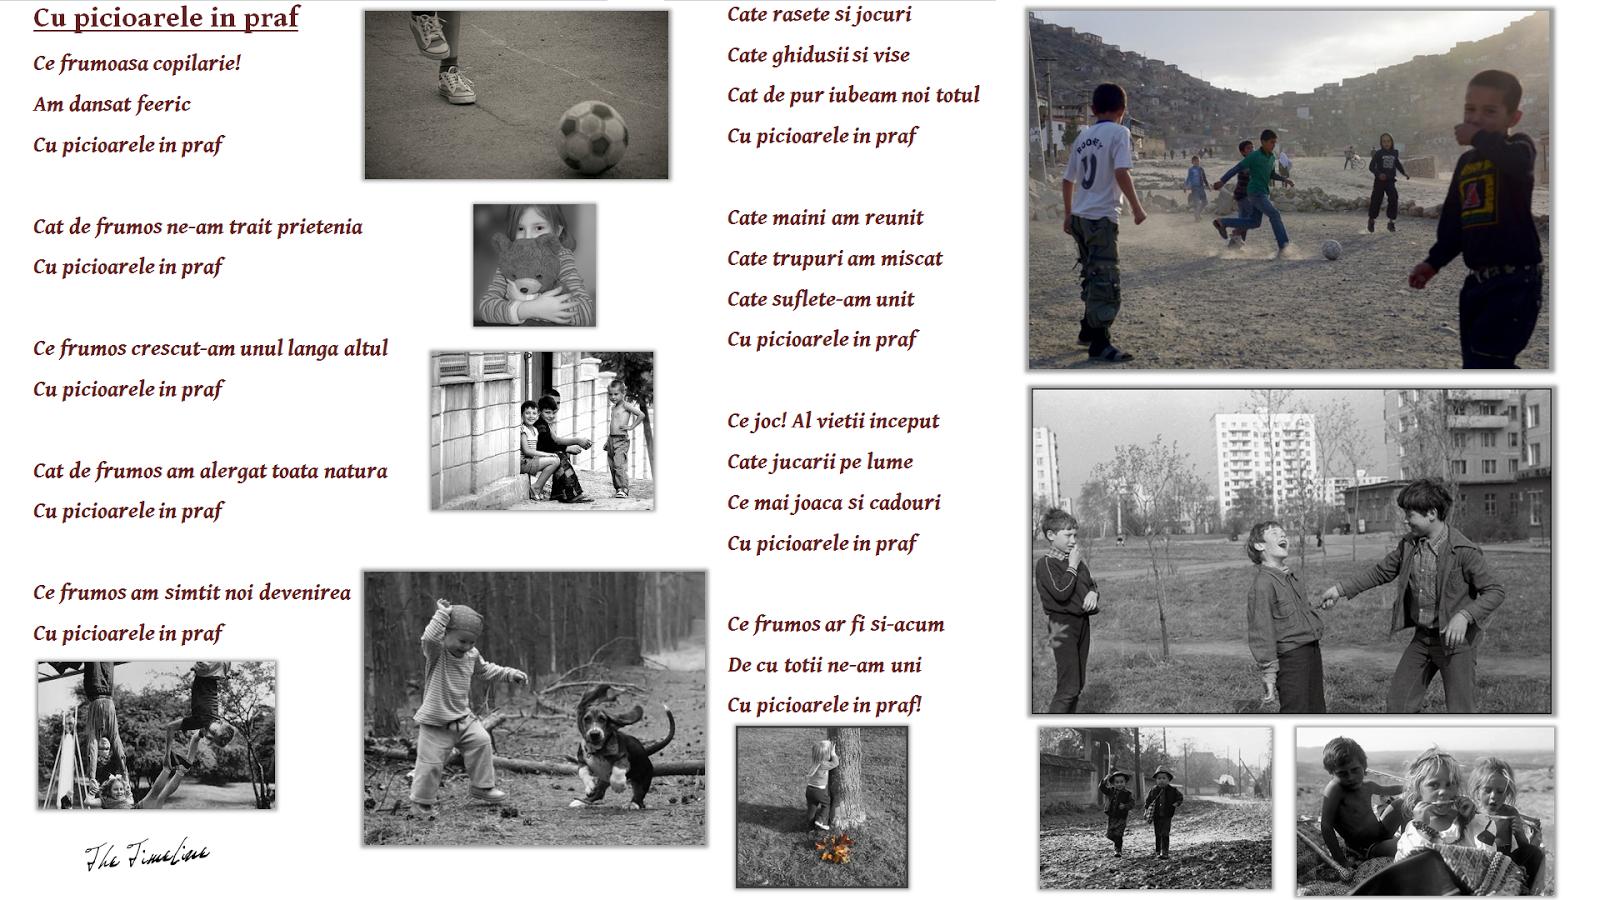 cu picioarele in praf poezie copilarie amintiri unitate umanitate